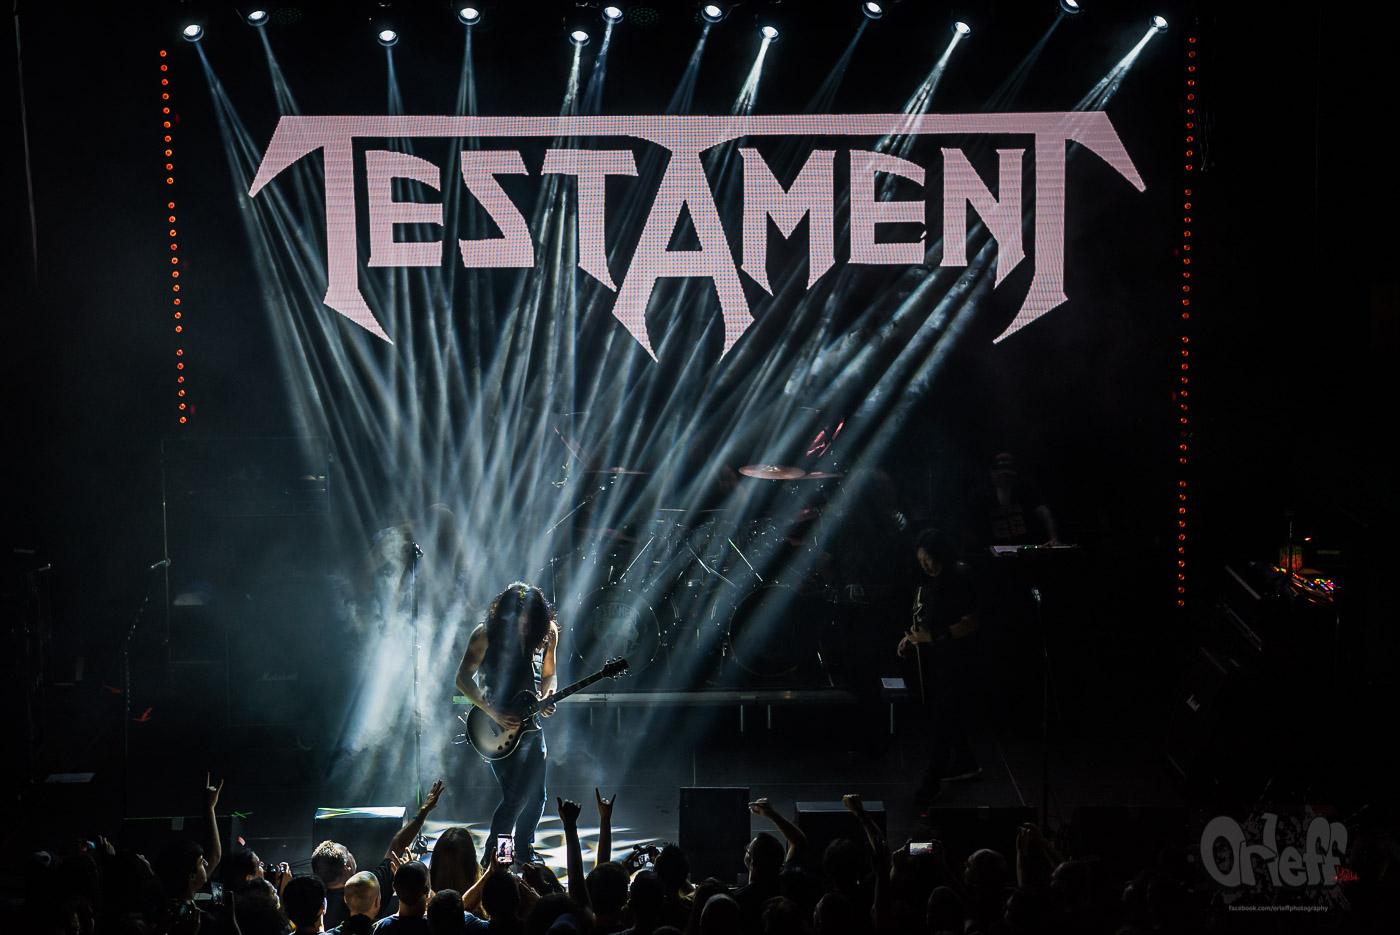 Testament @ Music Jam, 2019